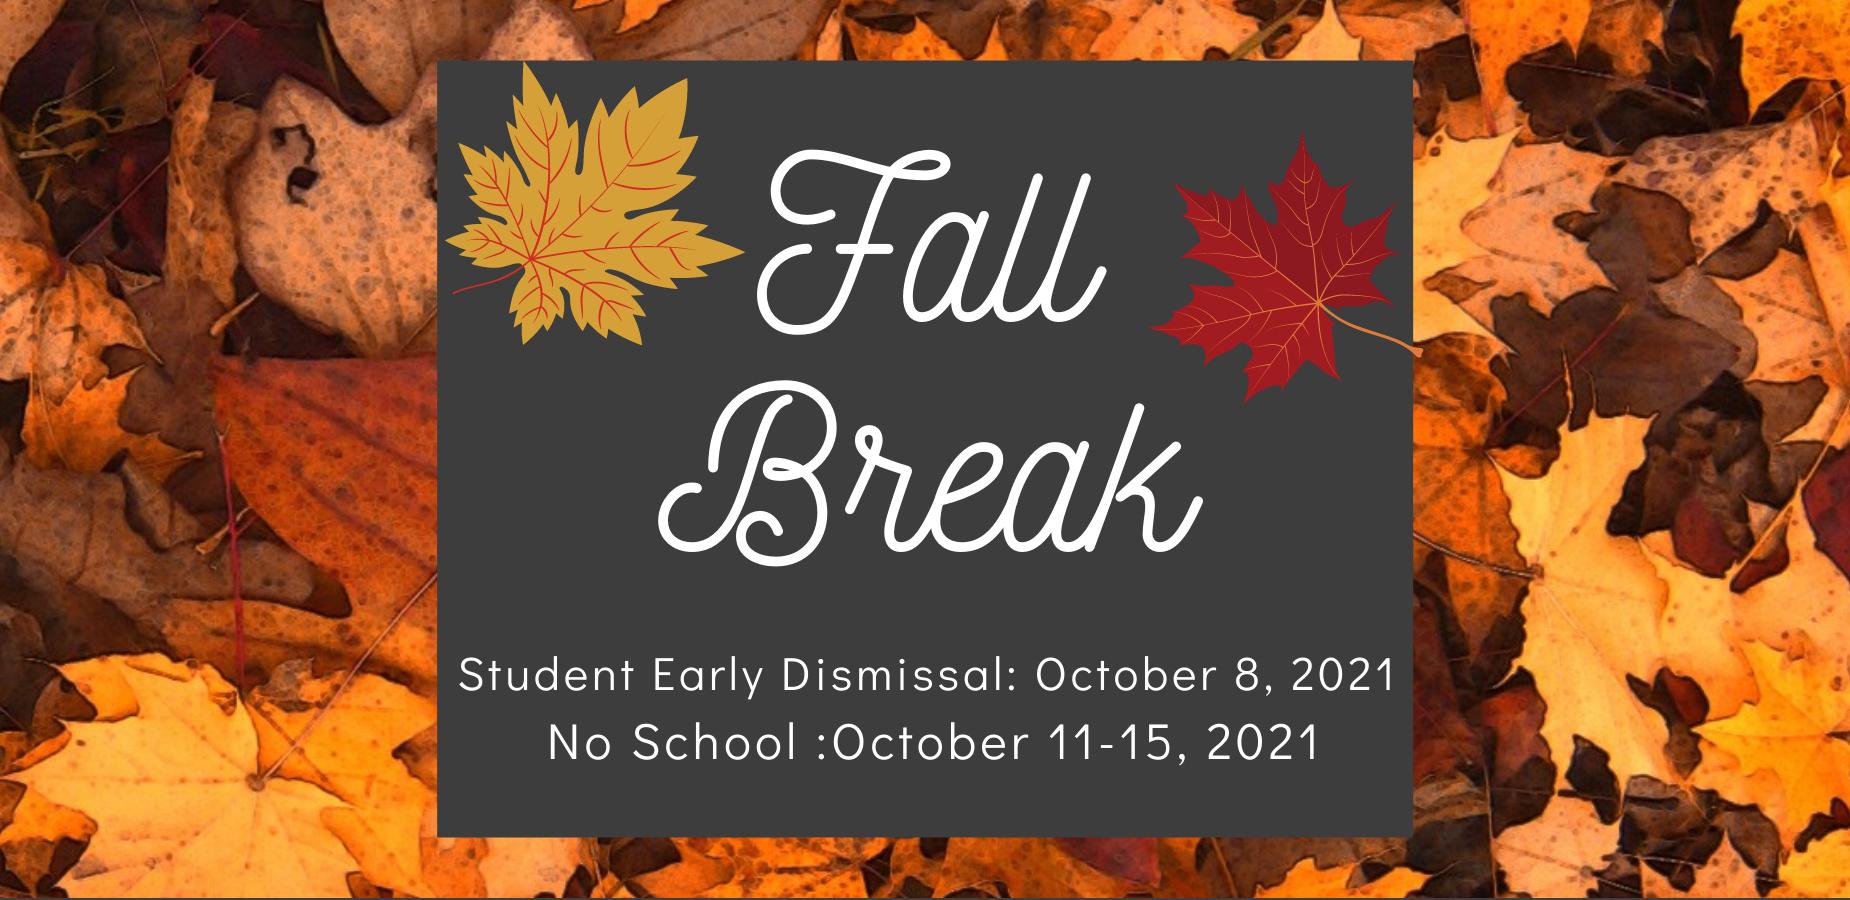 Student Early Dismissal 10/8/21 - Fall Break 10/11-10/15/2021